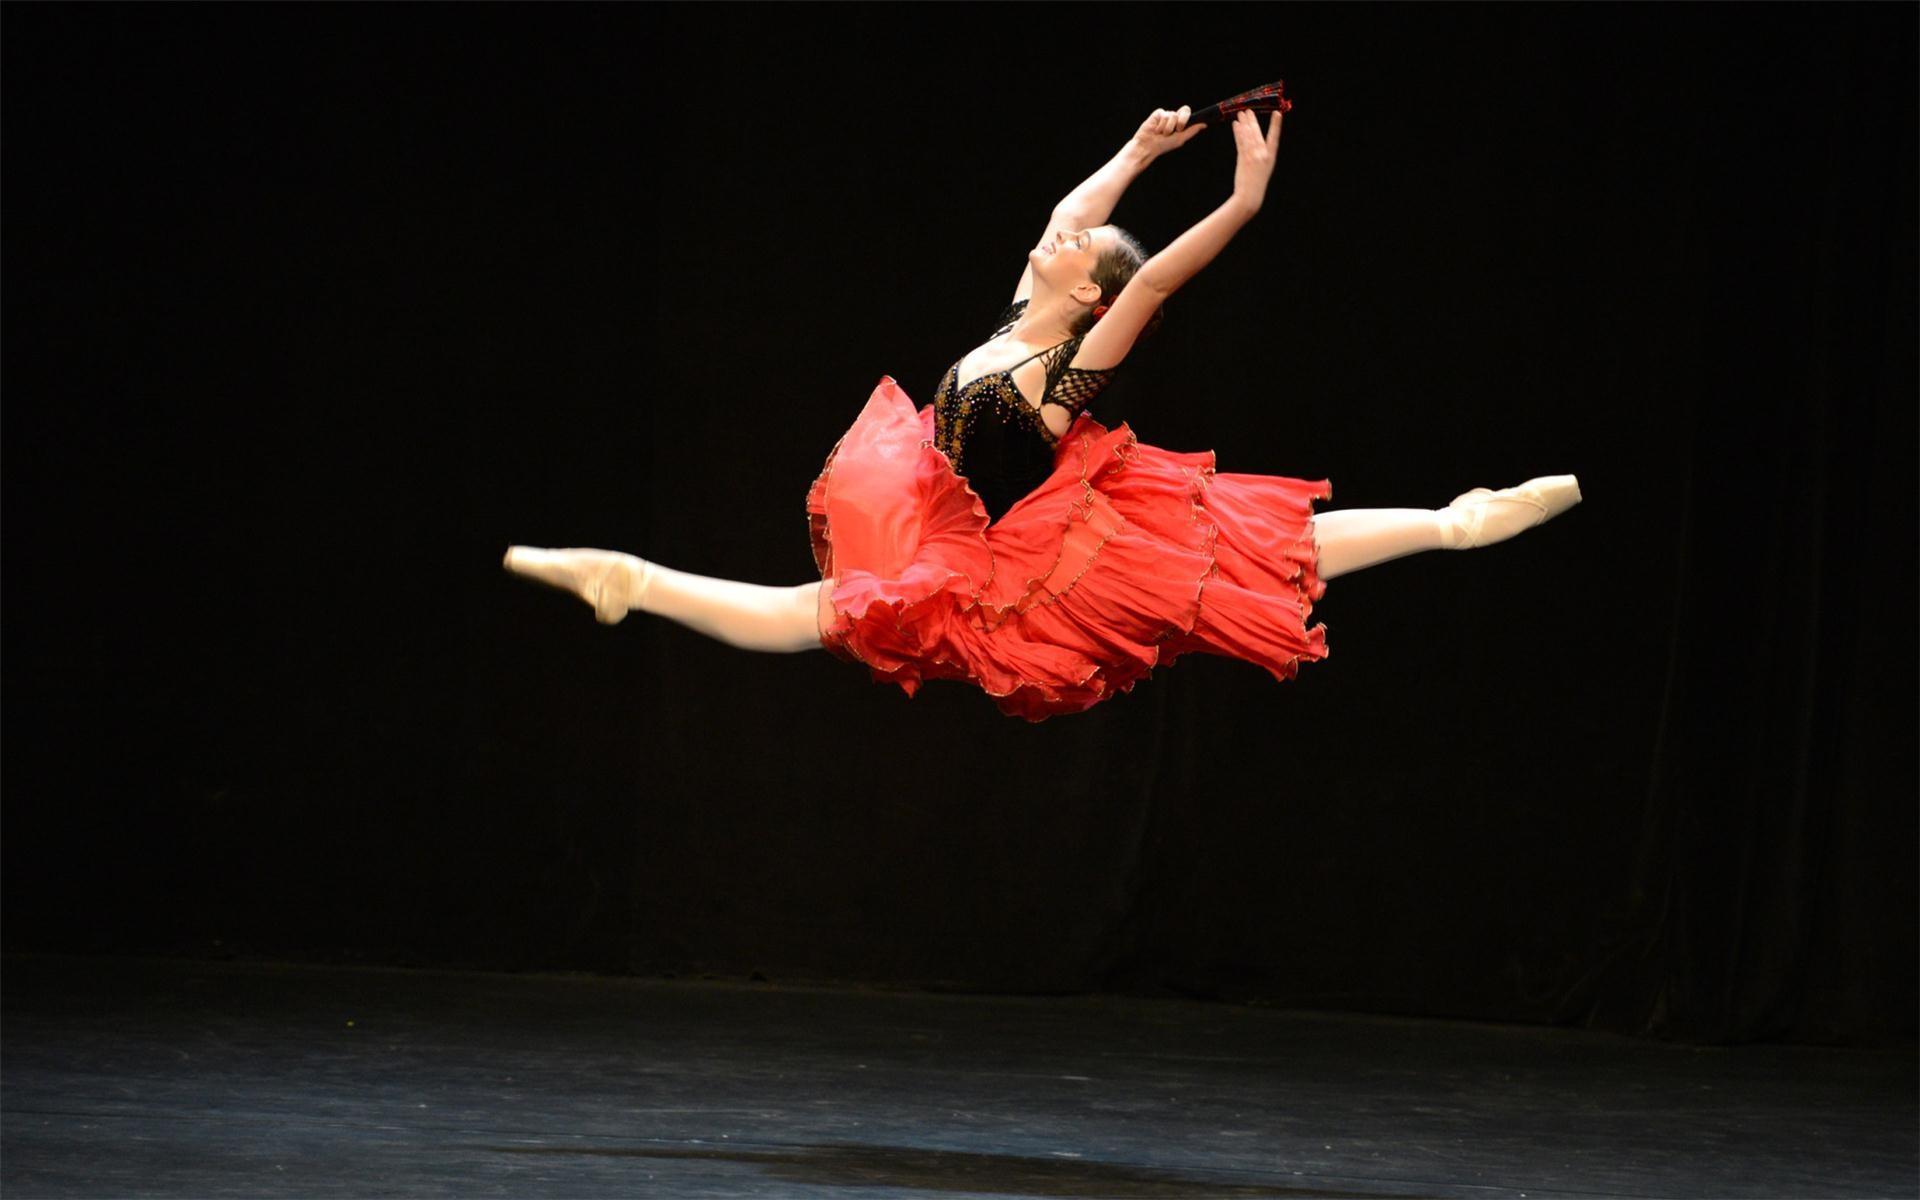 Ballet Dancer Wallpaper Free Wide Hd Wallpaper: Dab Dance Wallpaper (64+ Images